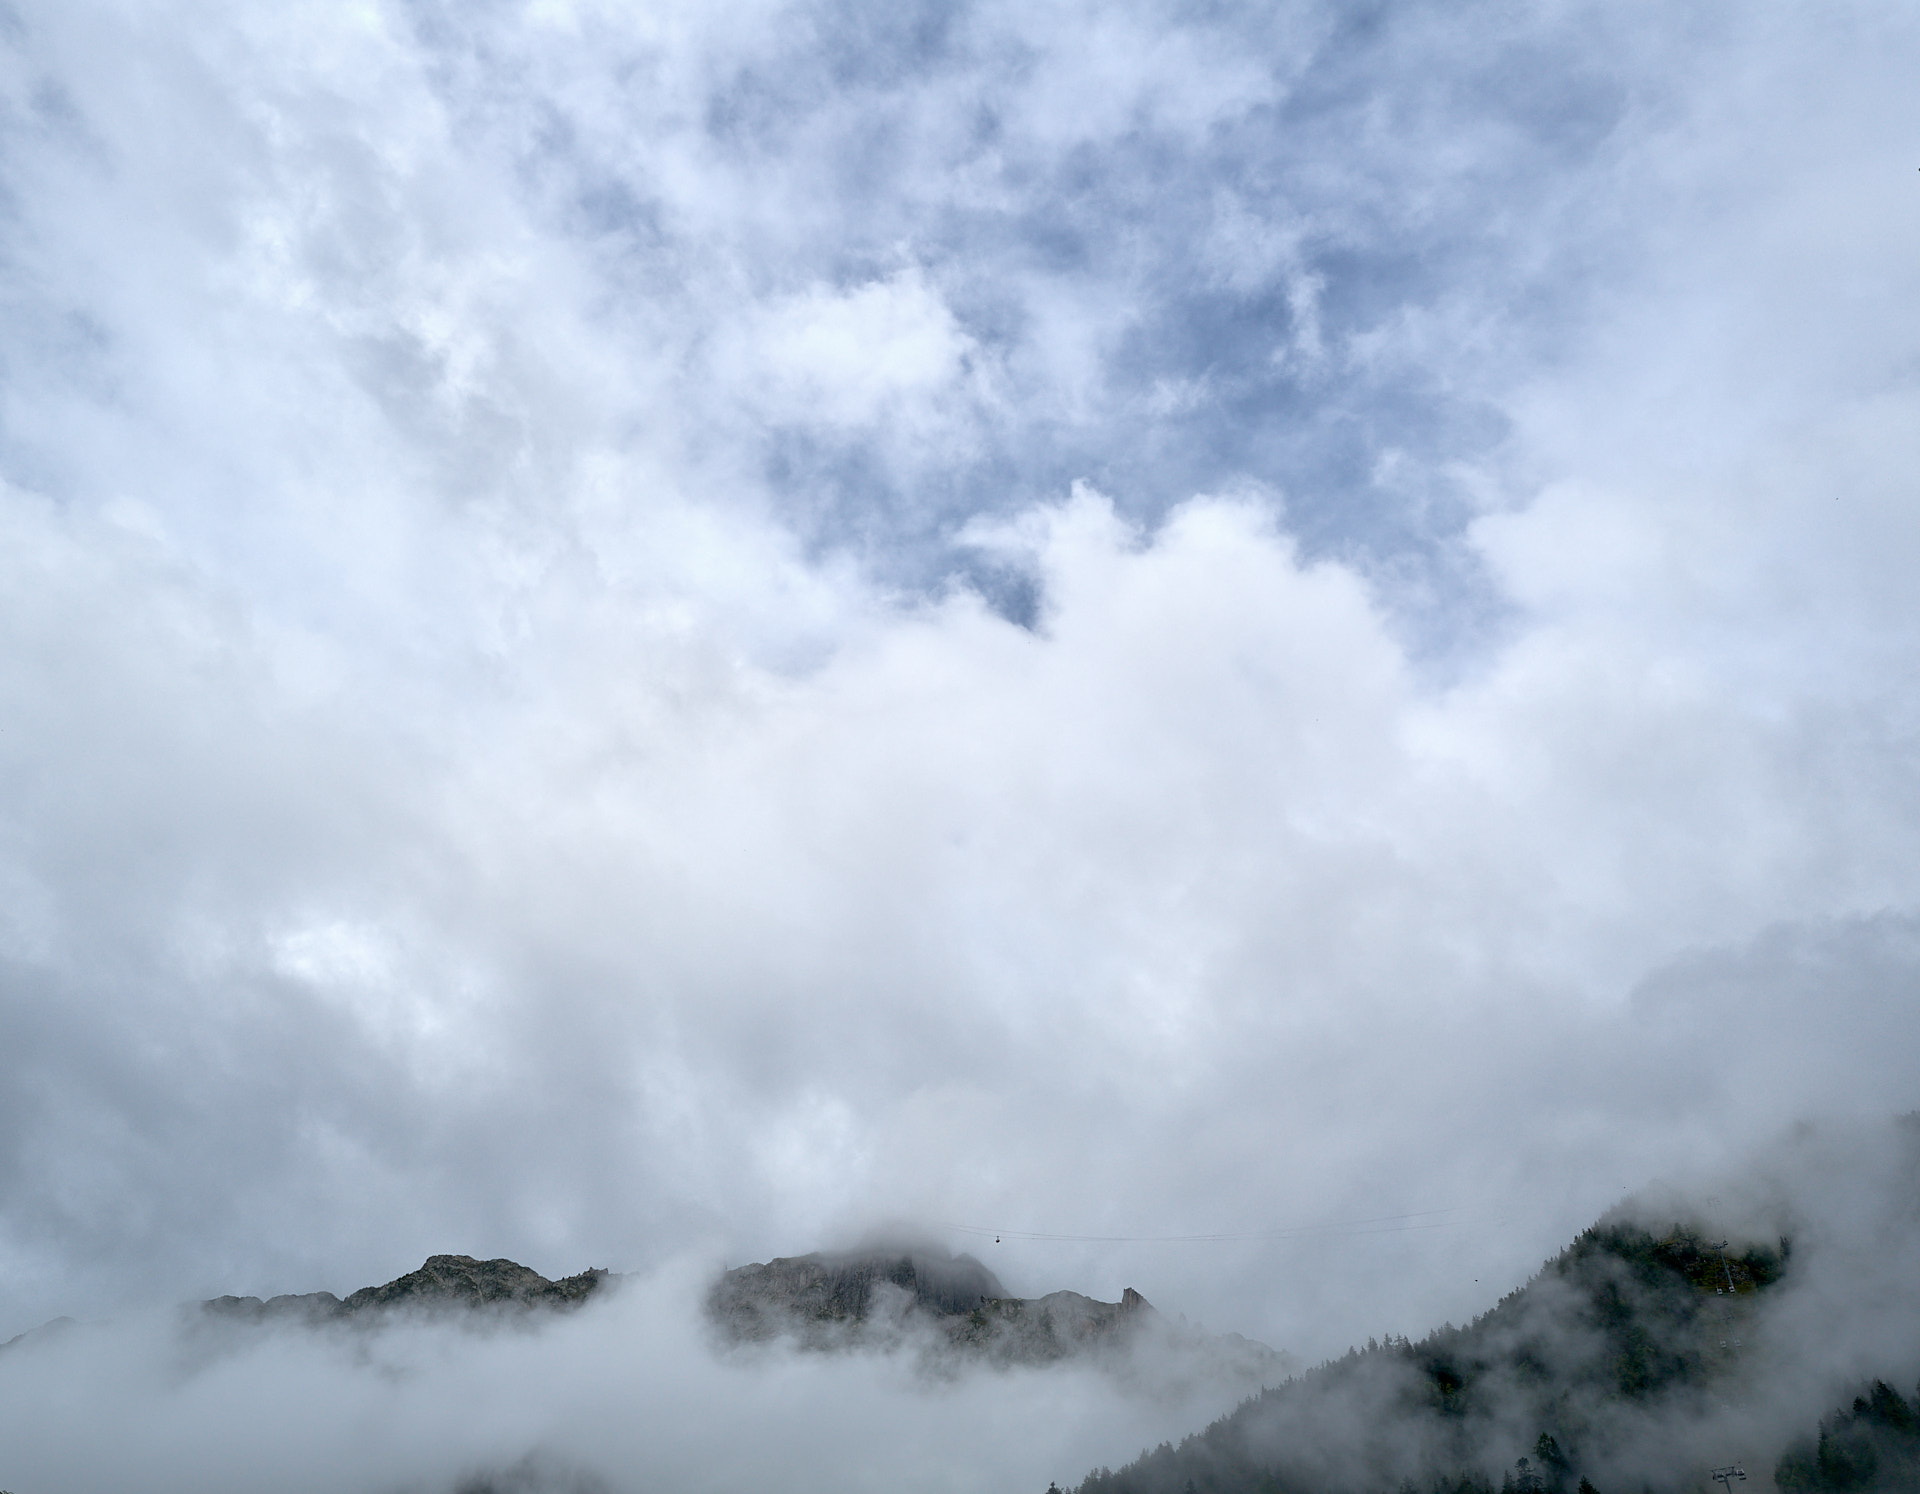 Chamonix, utsikt mot Planpraz och le Brévent